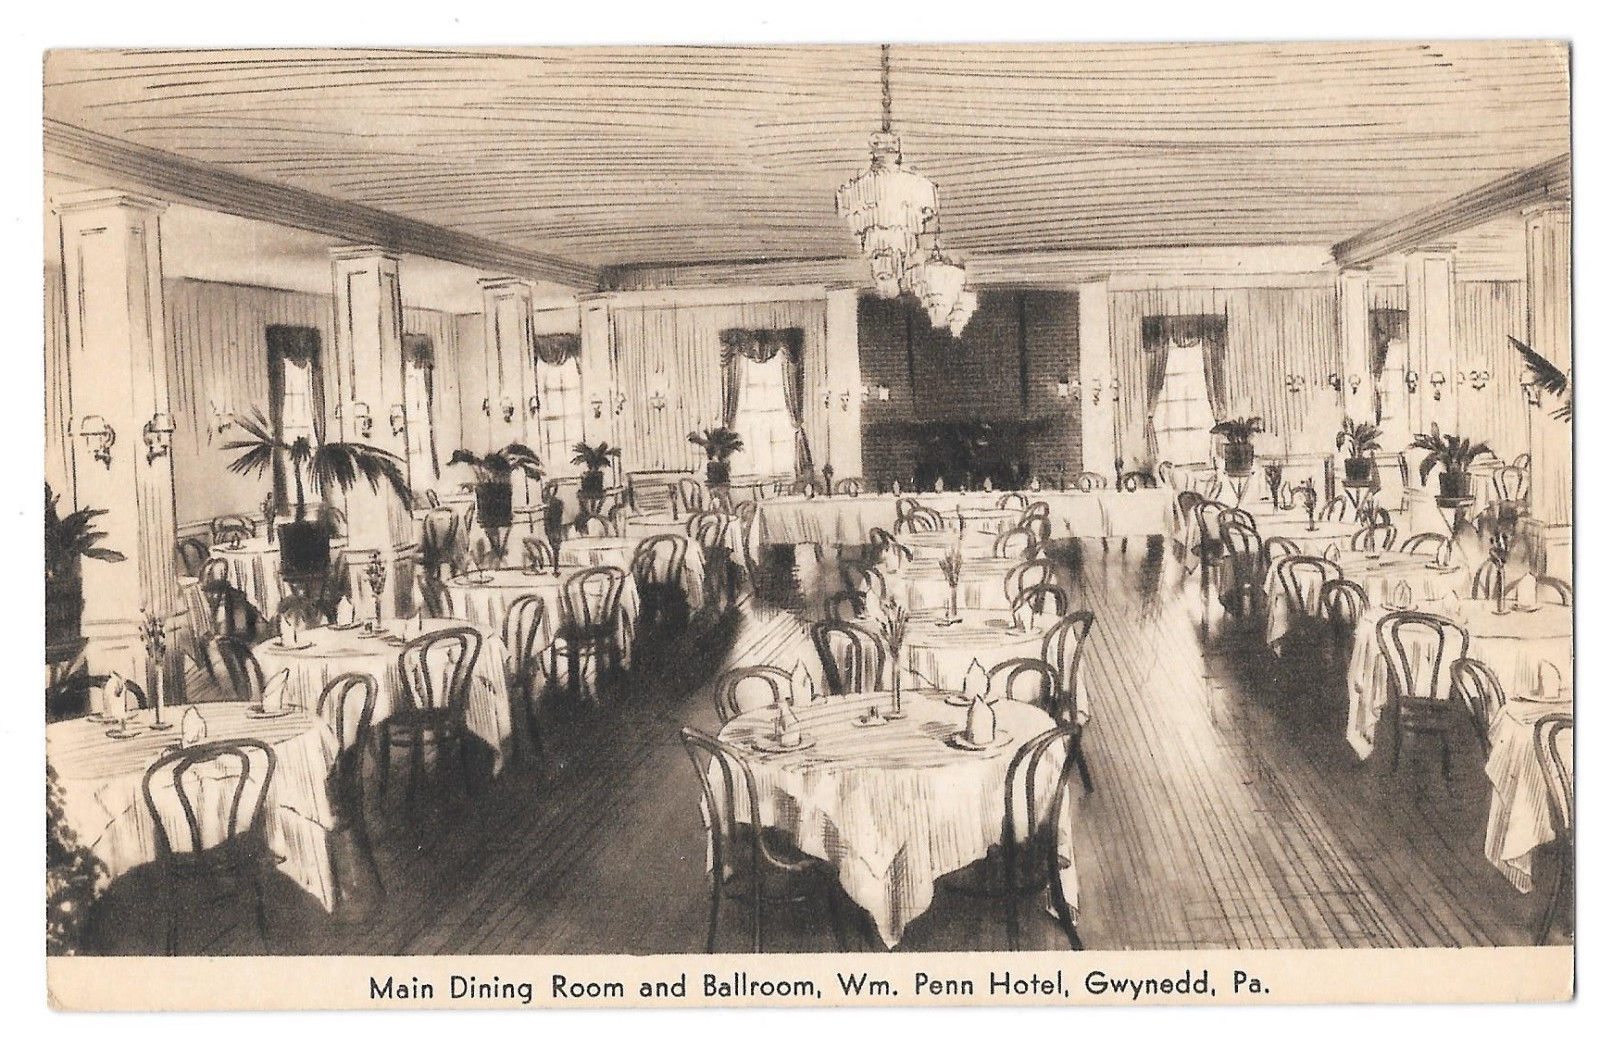 PA Gwynedd Wm. Penn Hotel Dining Room Ballroom Interior Vtg Advertising Postcard